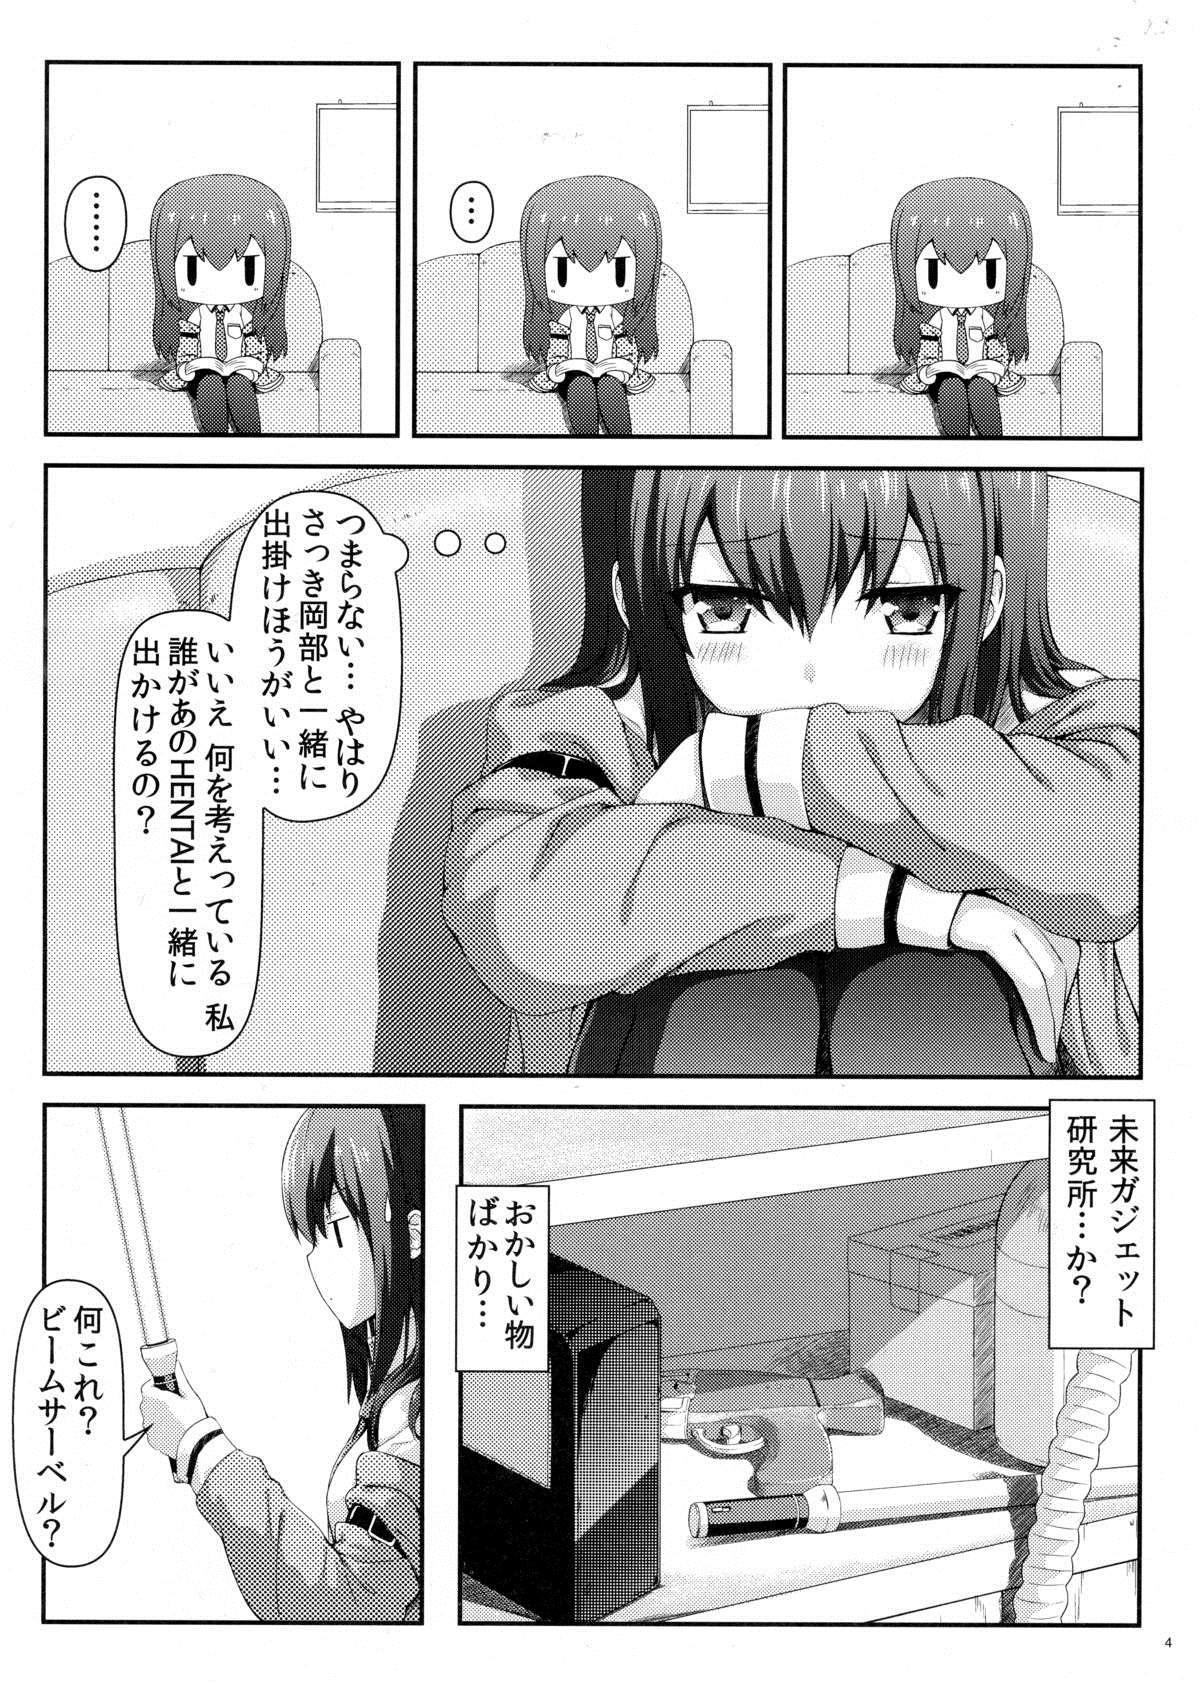 Tengoku e no Bullet Train 2